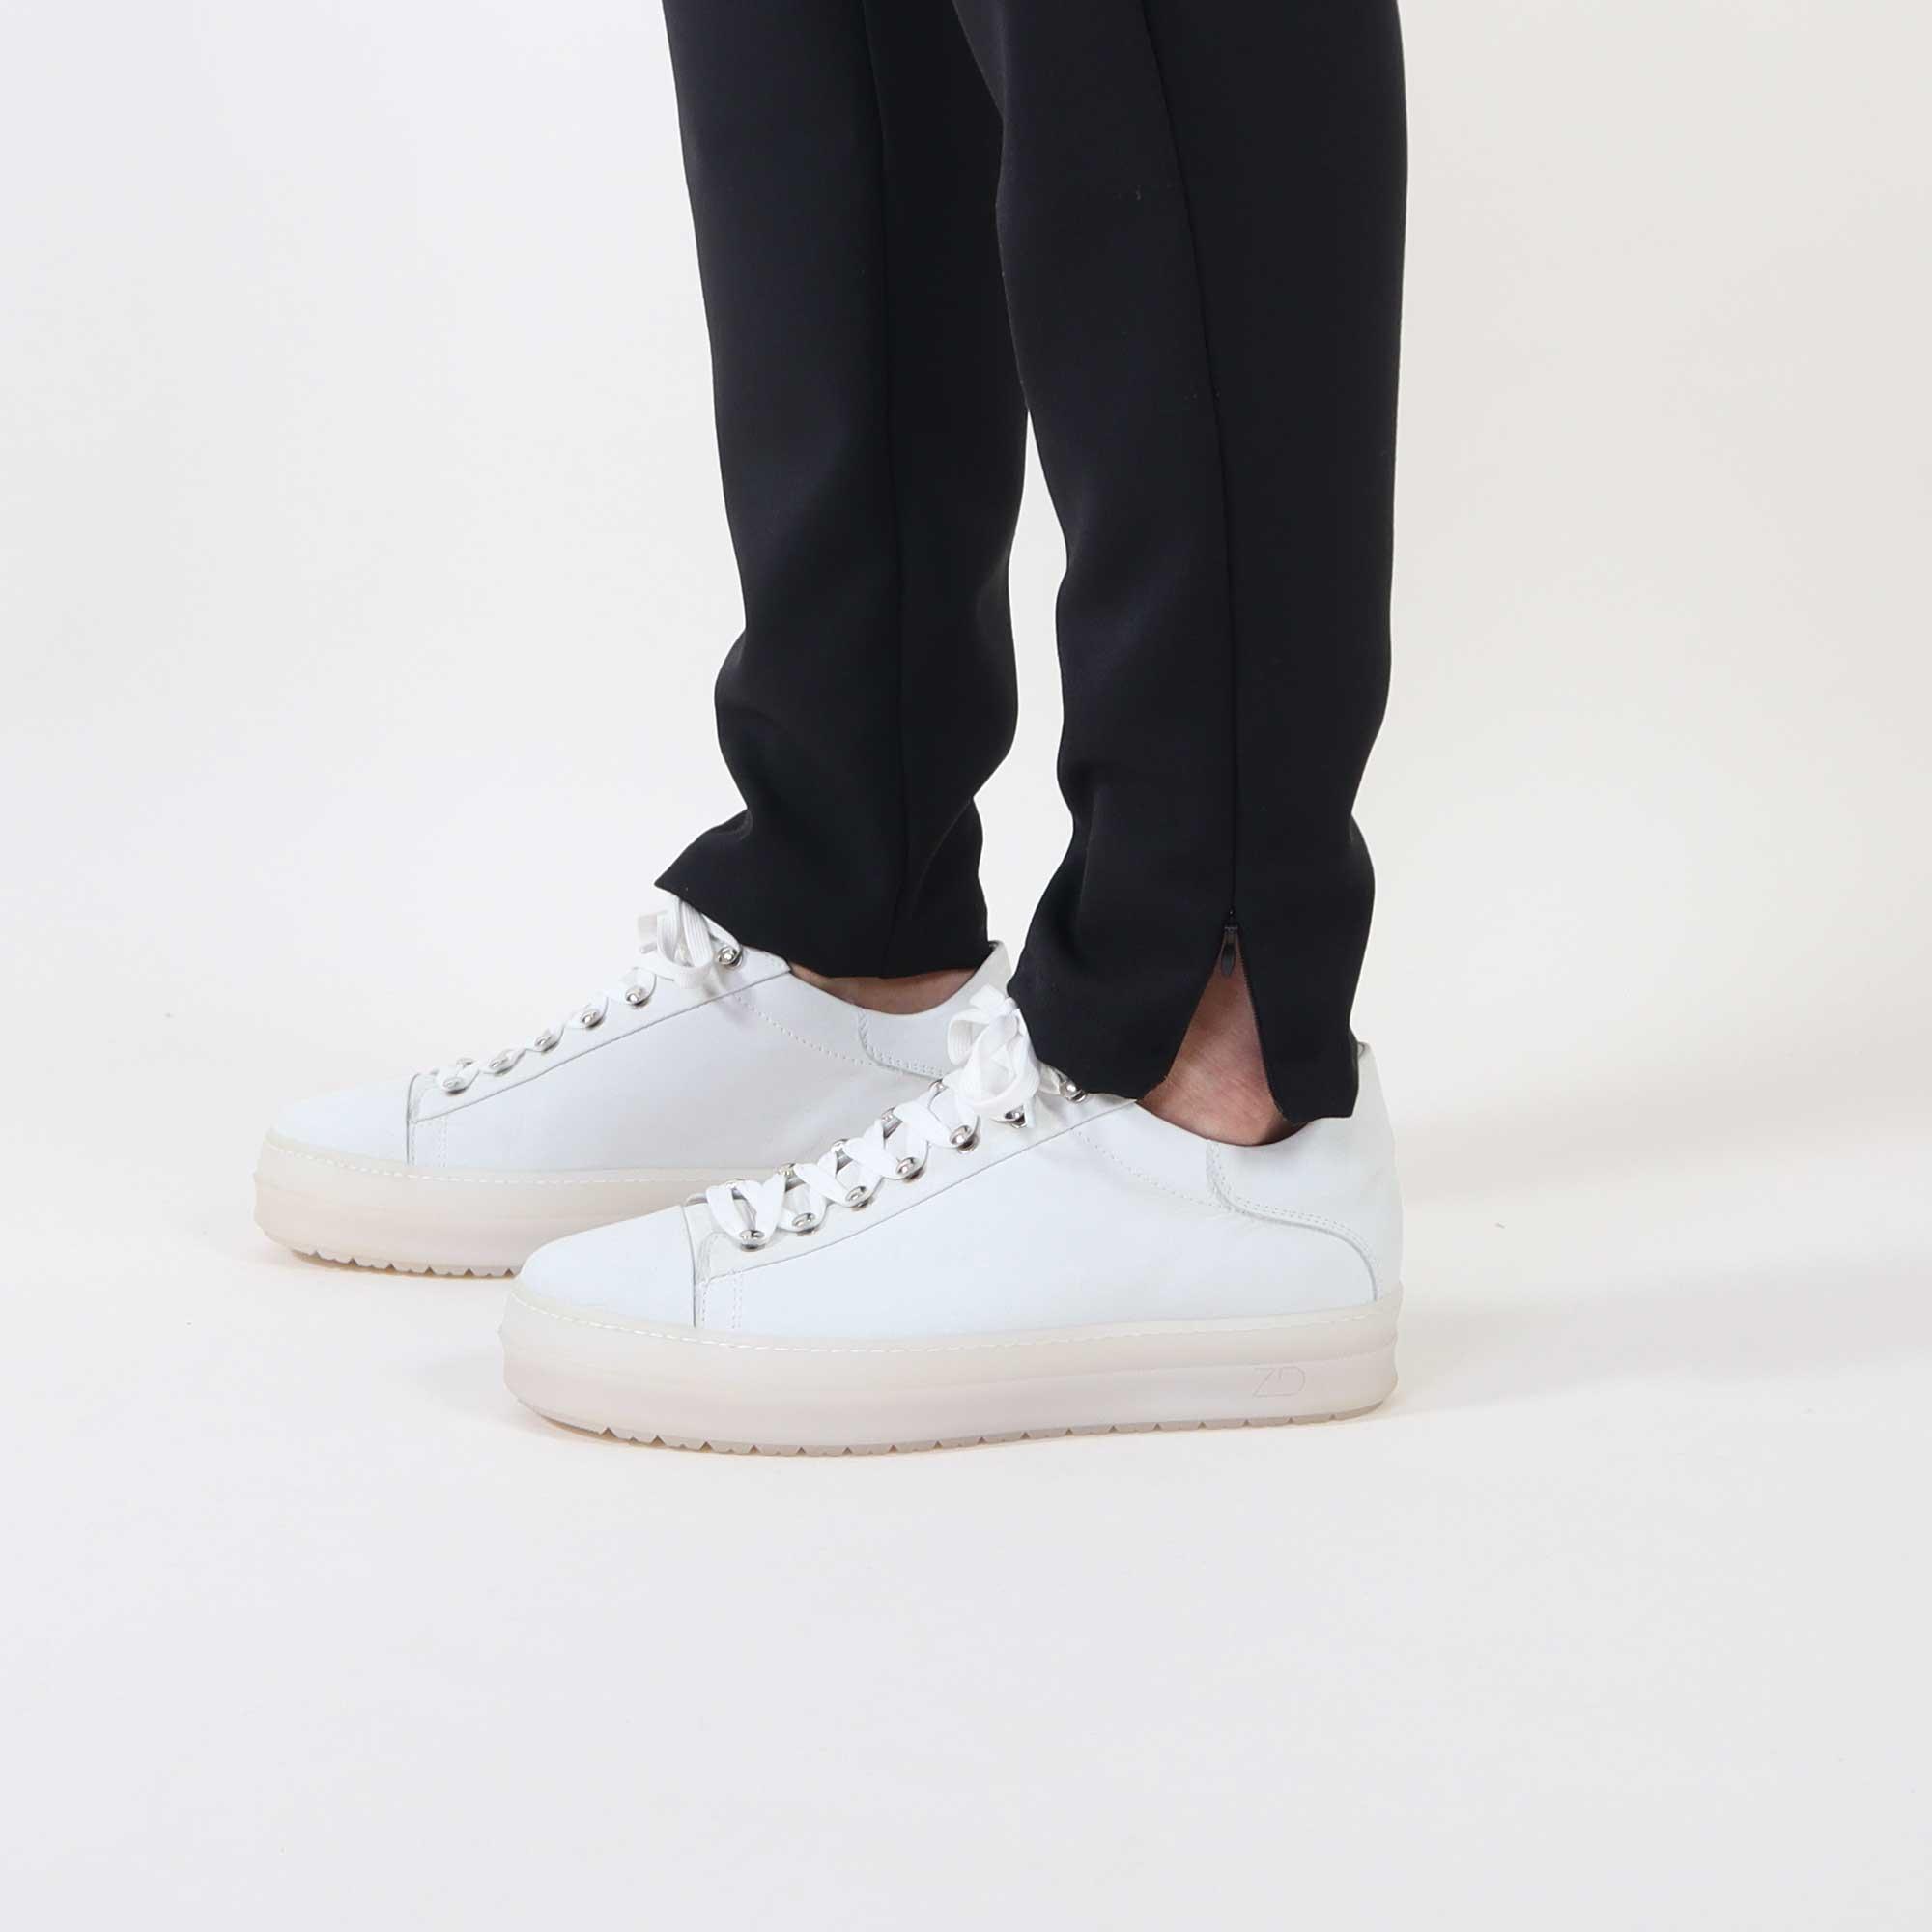 punto-pants-offwhite-5